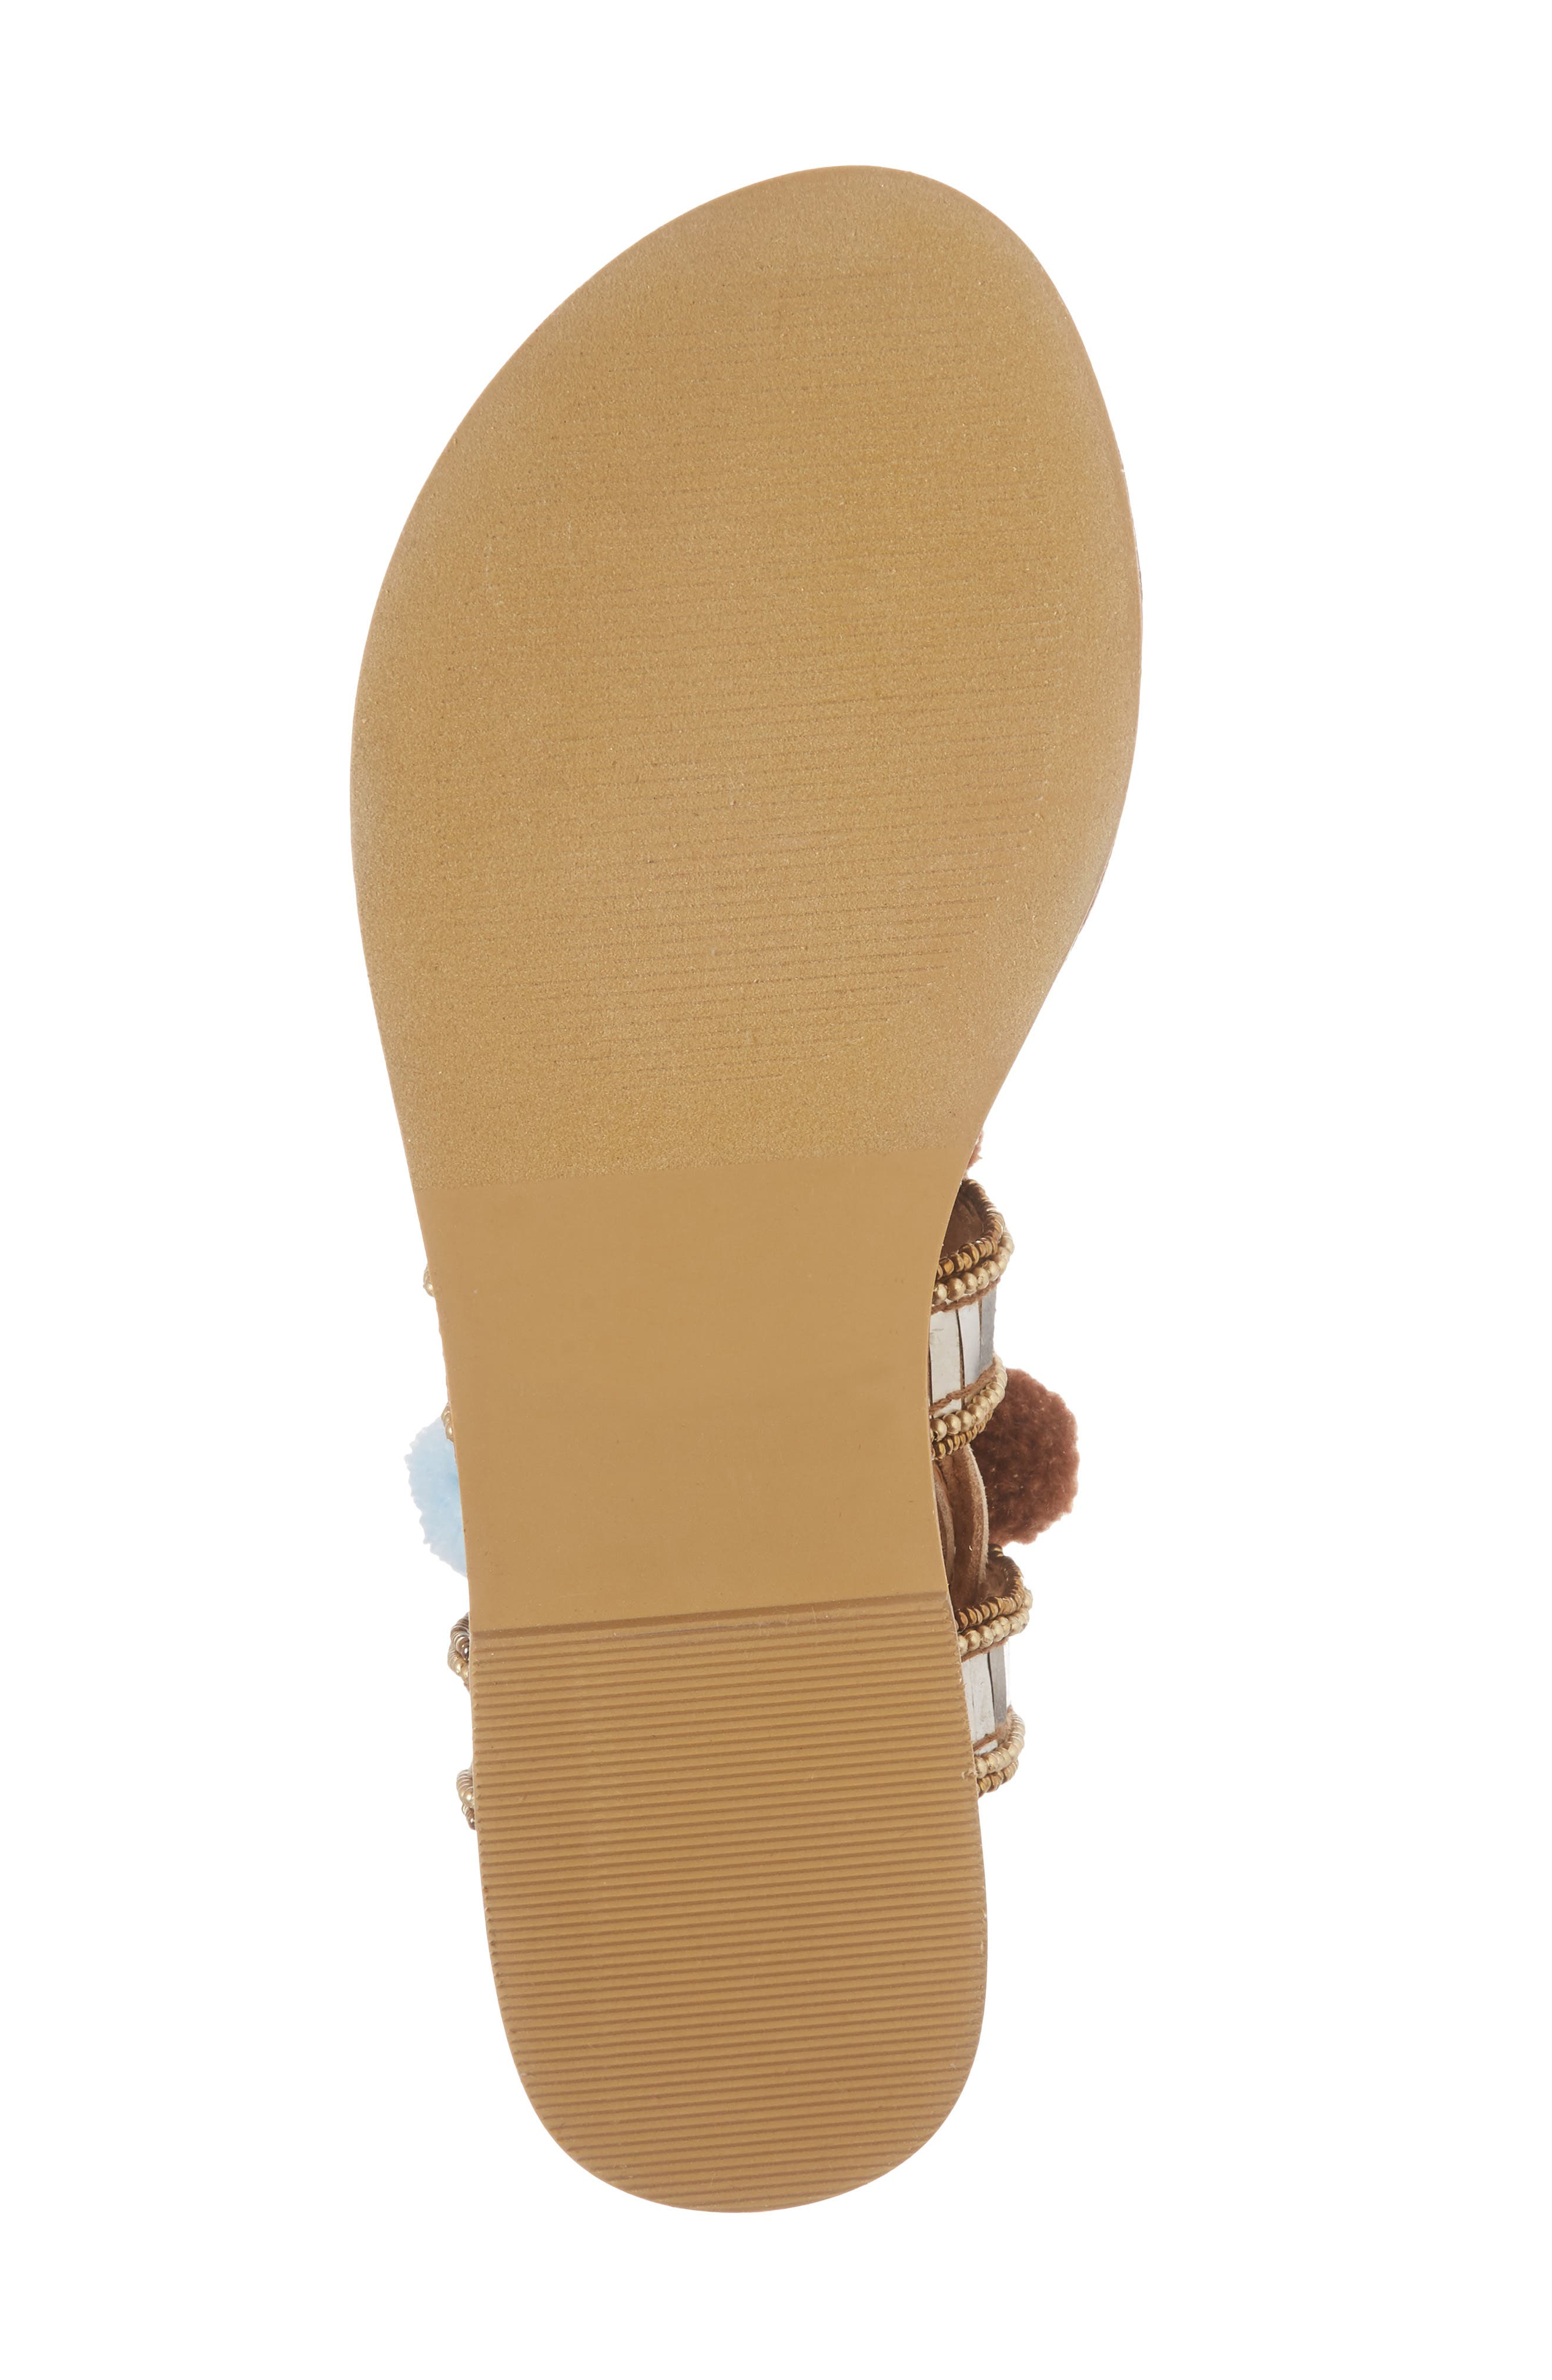 Bassie Ankle Strap Sandal,                             Alternate thumbnail 6, color,                             Brown Multi Faux Suede